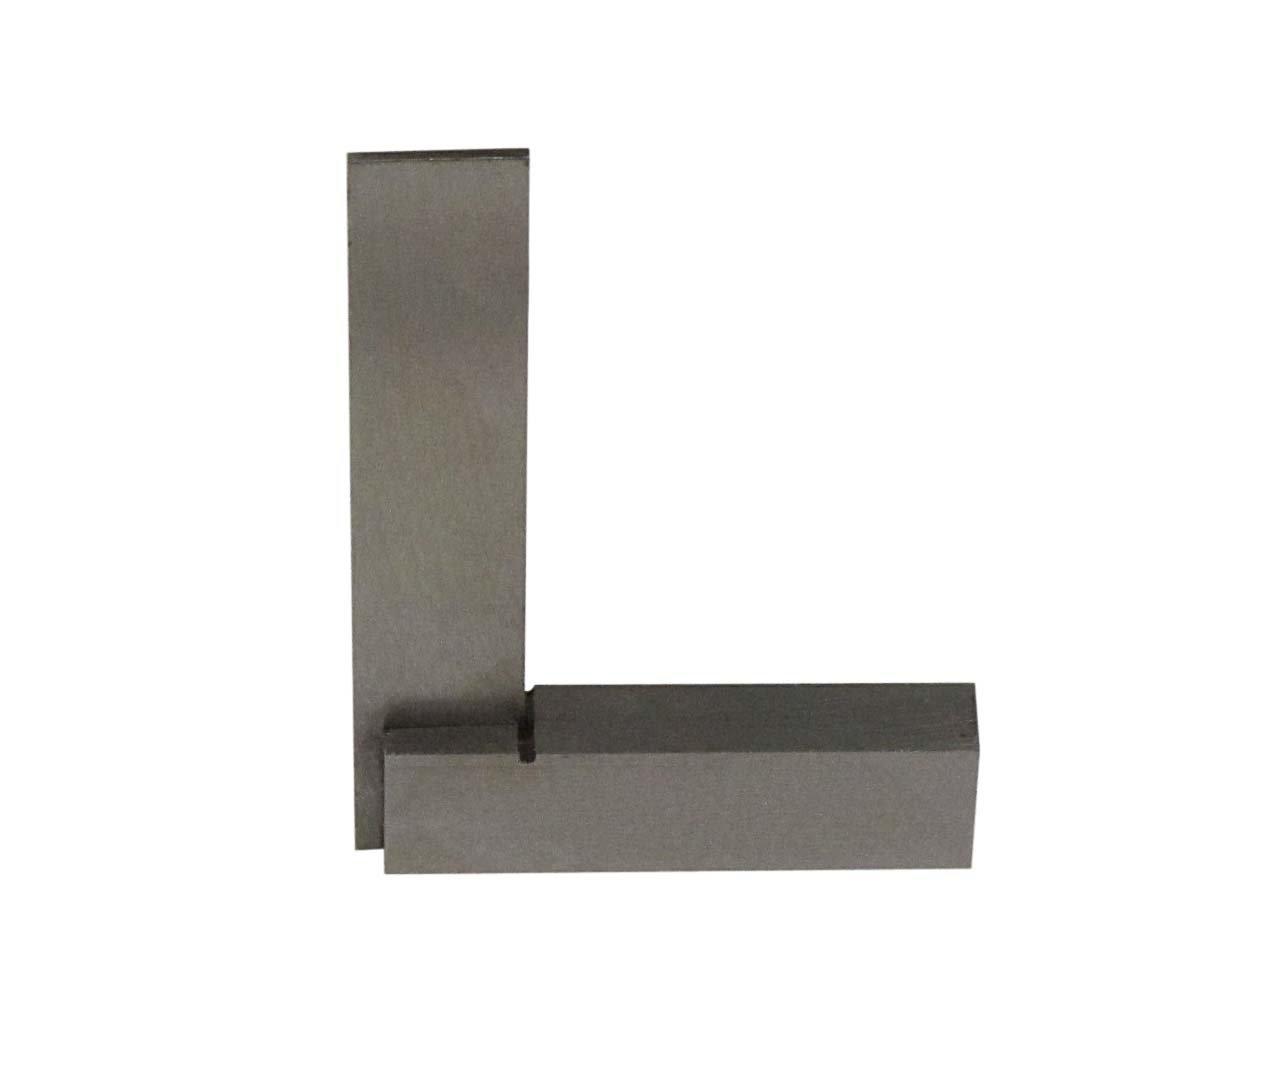 SE TS3 3 Steel Machinist Square